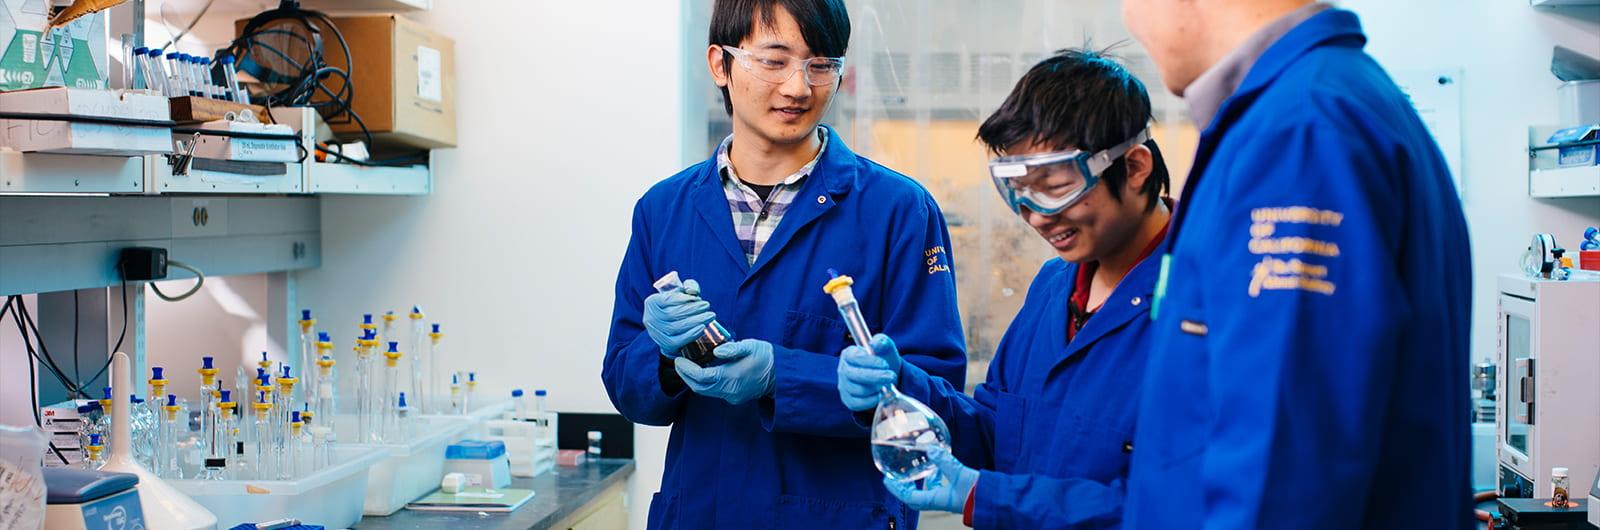 Chemist Shaowei Chen talks to students in lab, UCSC Science, photo credit Elena Zhukova 2019